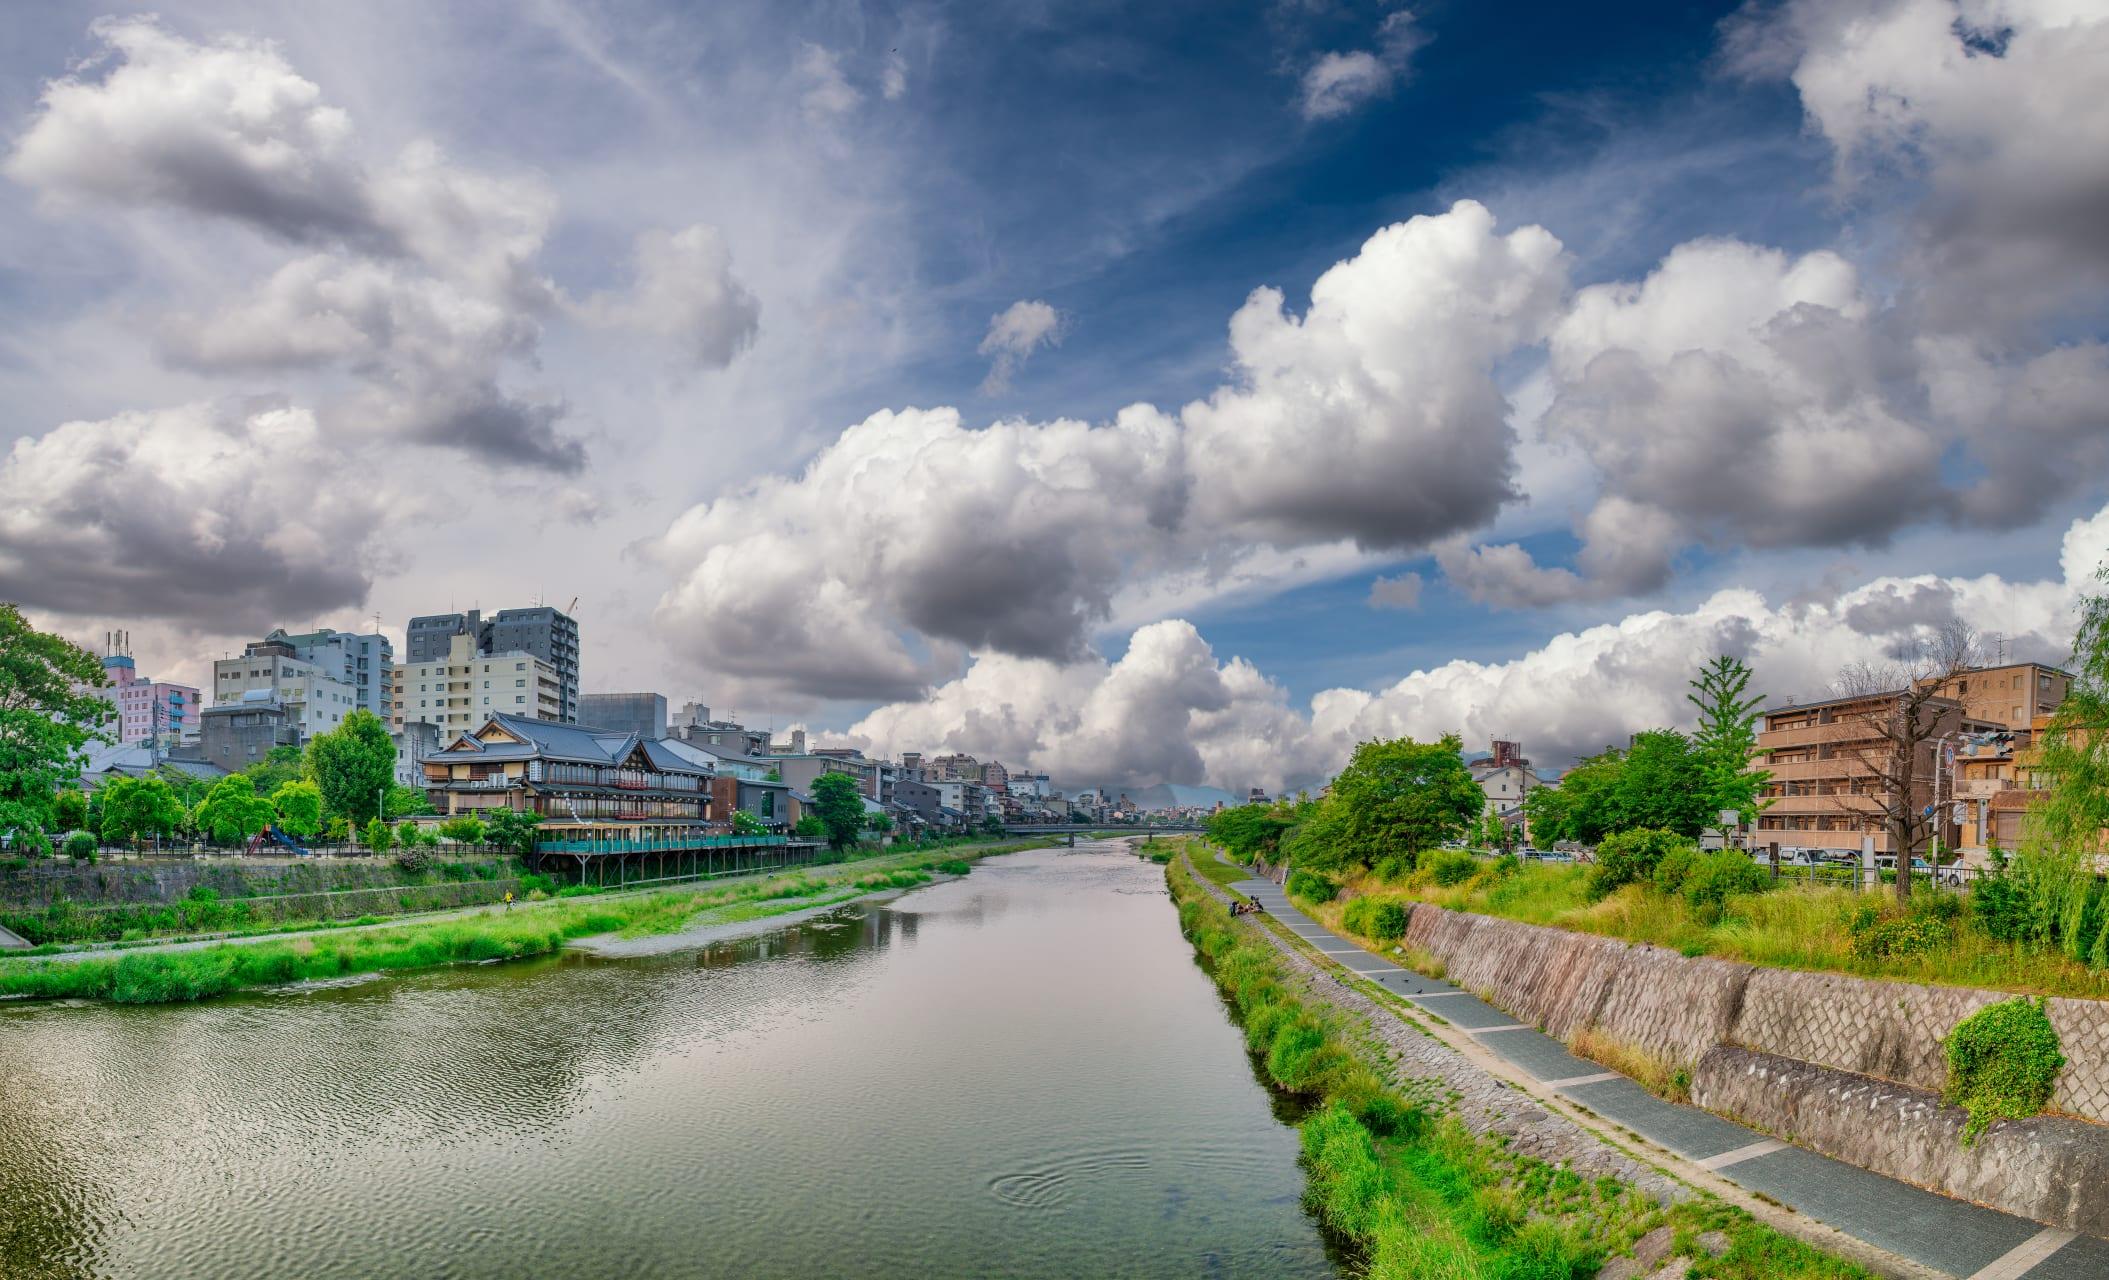 Kyoto - East Kyoto by Bike